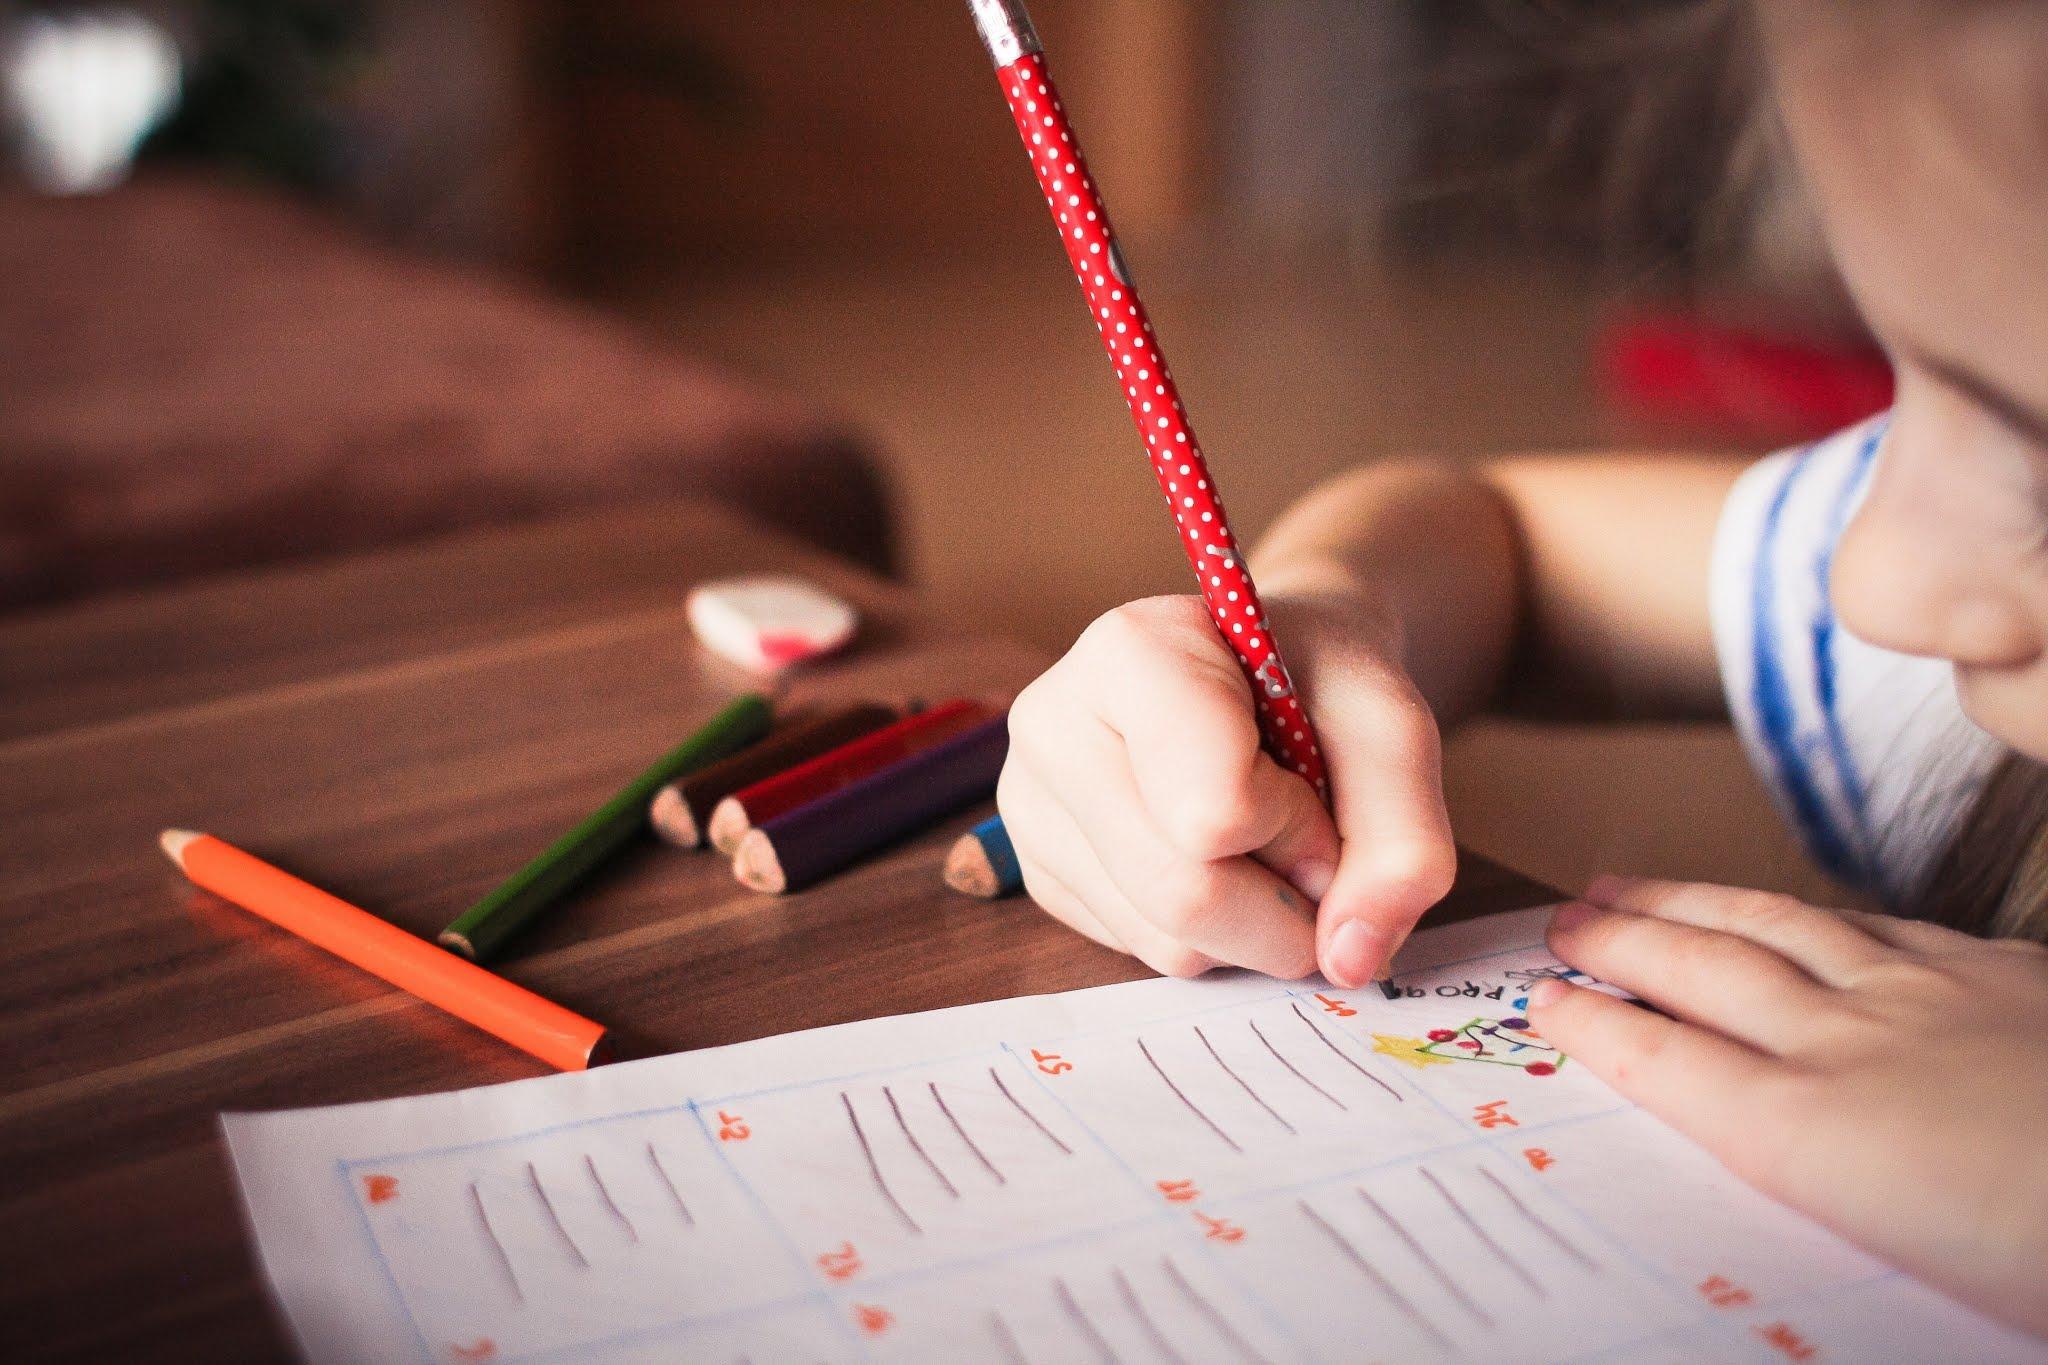 Mempersiapkan Keperluan Dana Pendidikan Anak di Masa Depan